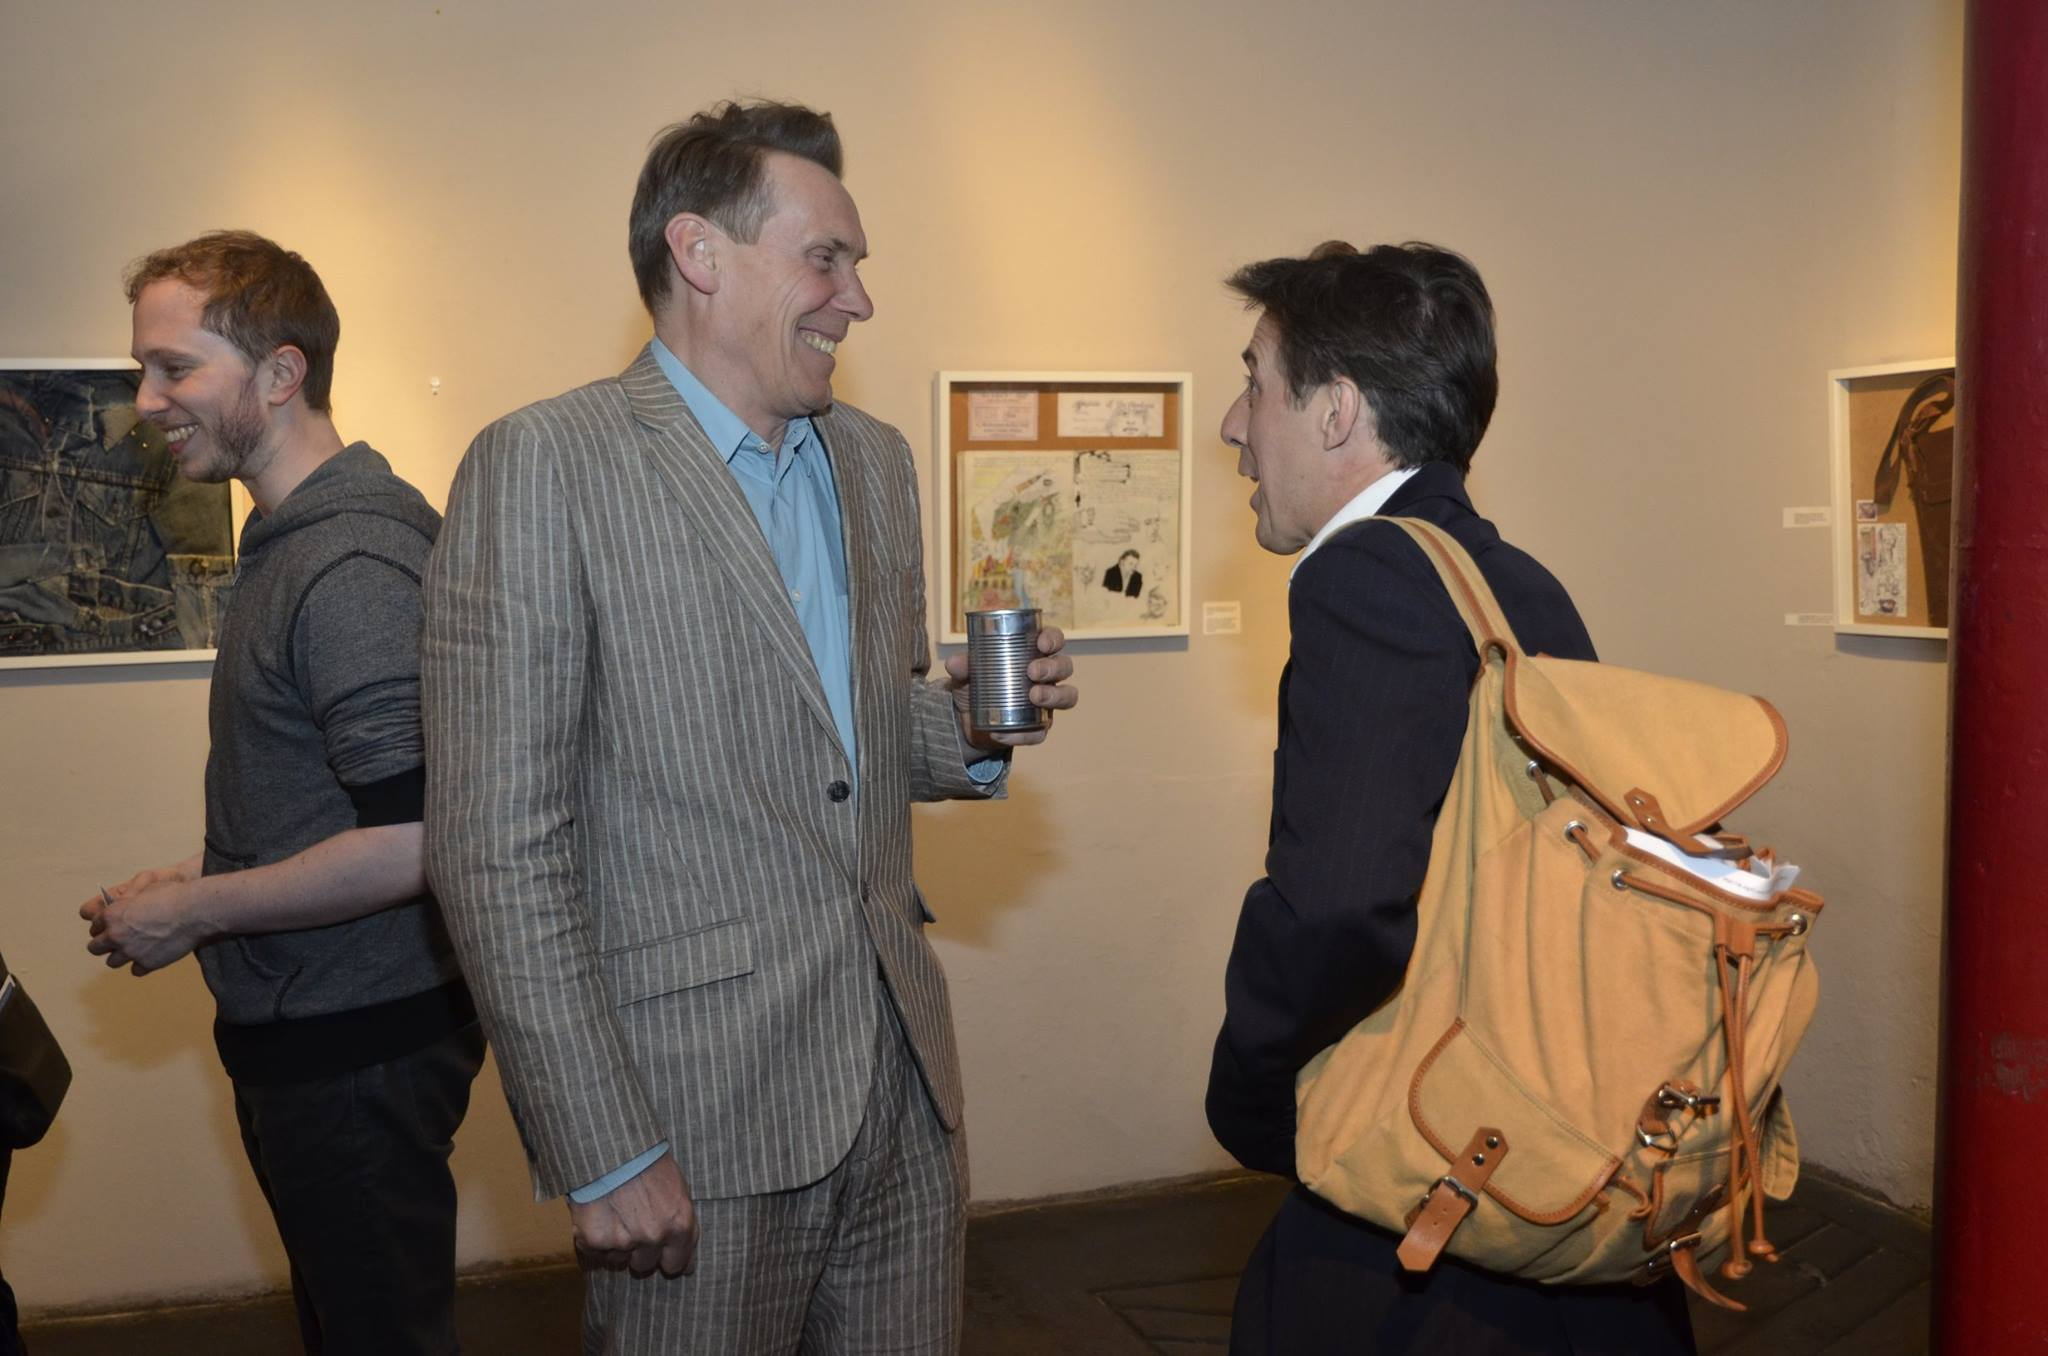 William and  Paul Bigley in conversation